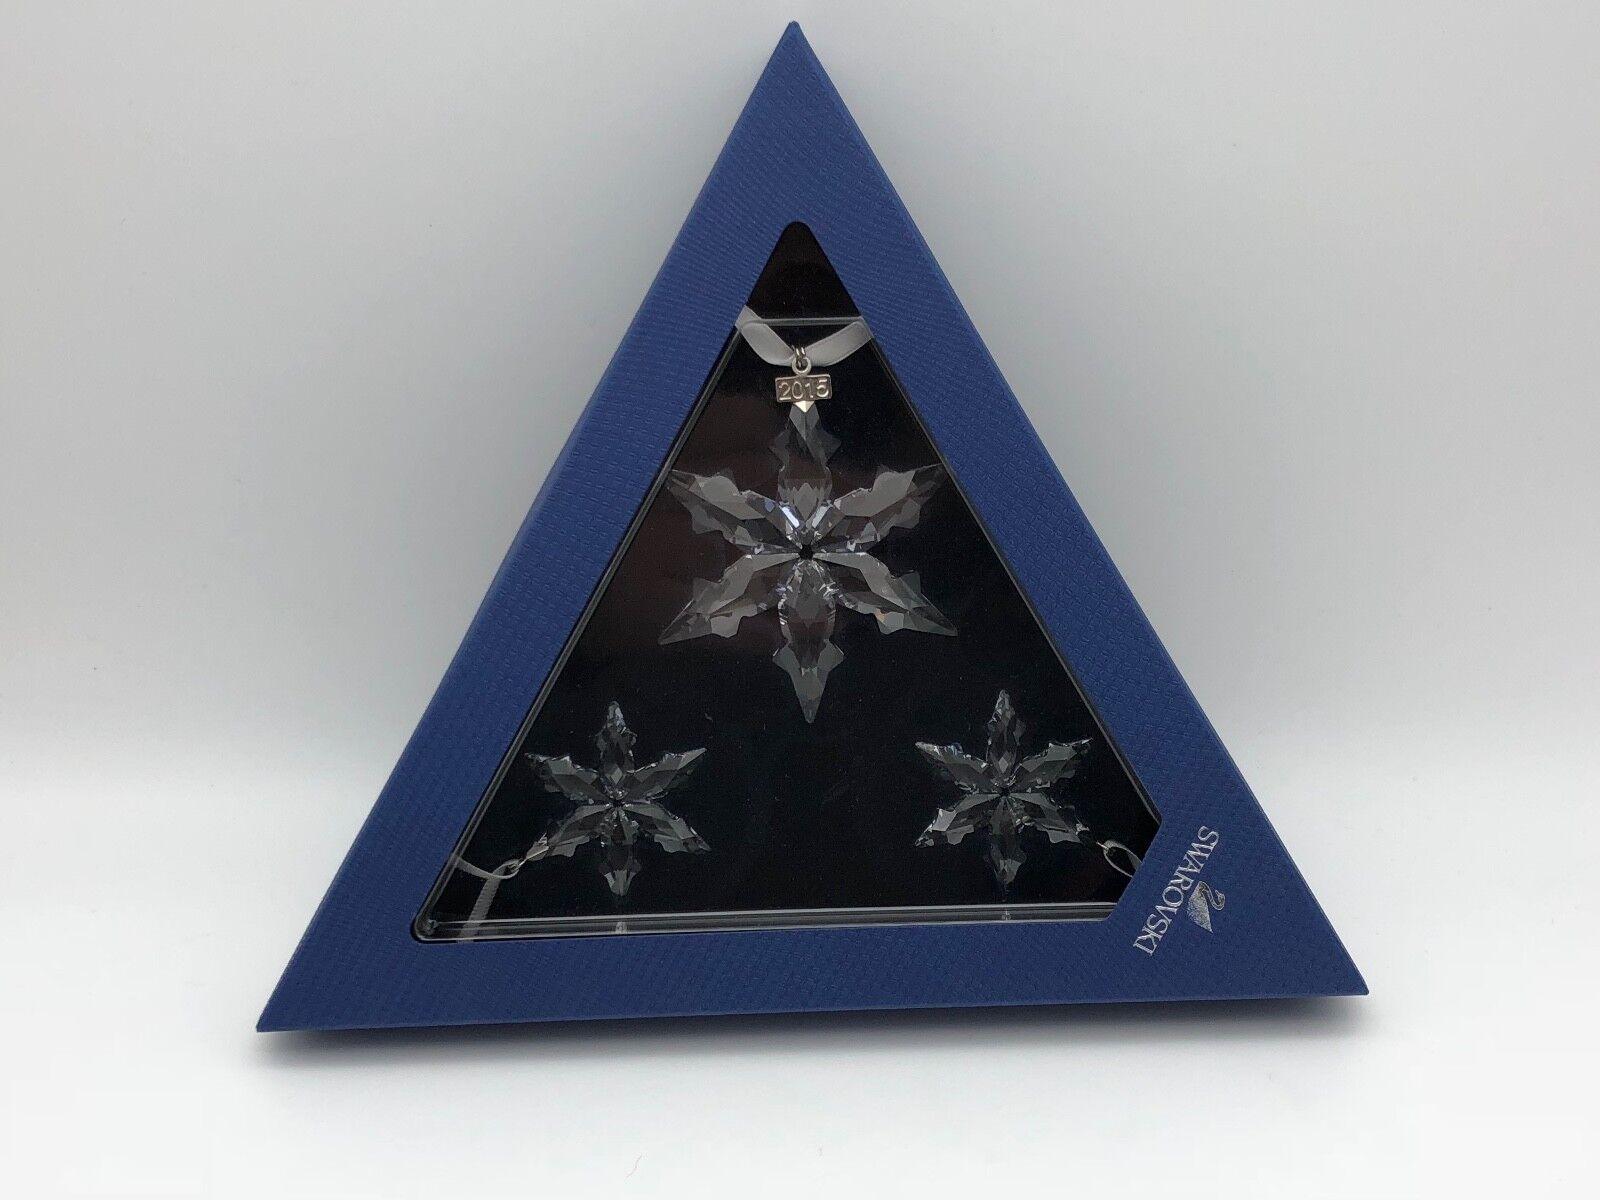 Swarovski Figurine de Noël étoile-set 2015. article neuf avec avec avec emballage 73834a